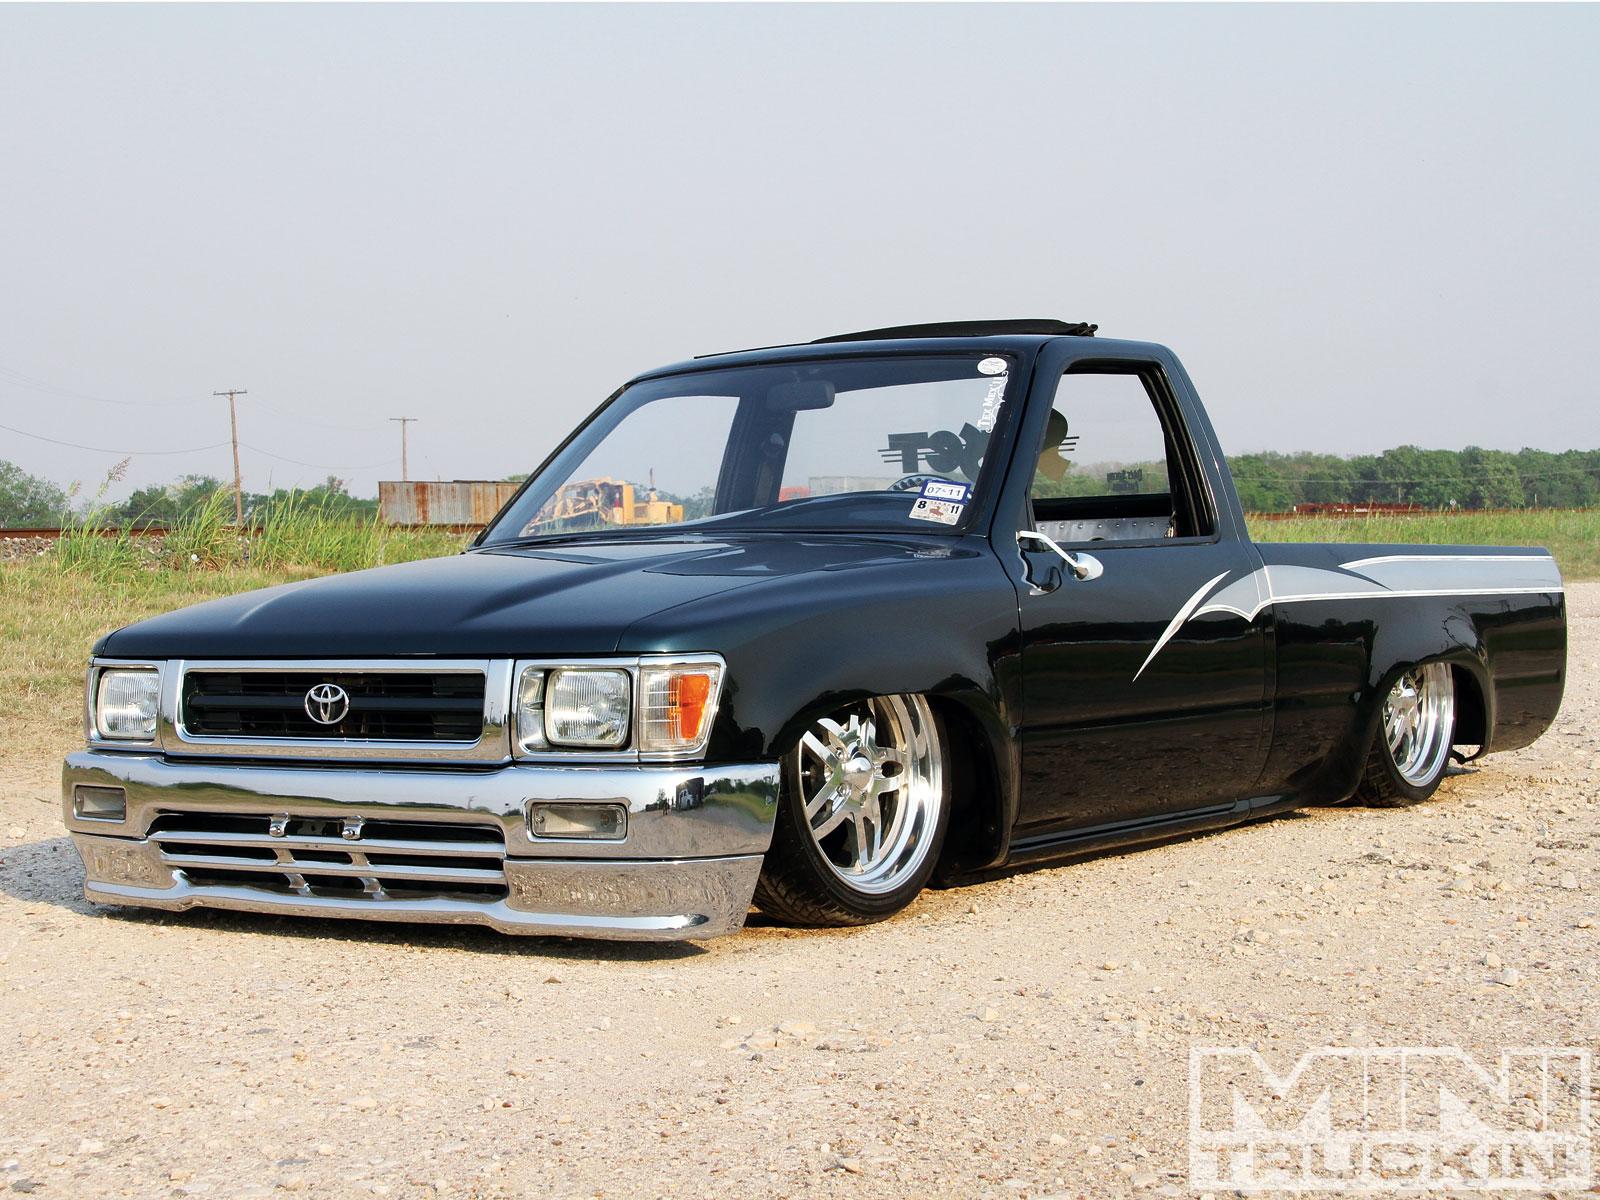 1994 Toyota Pickup Image 4